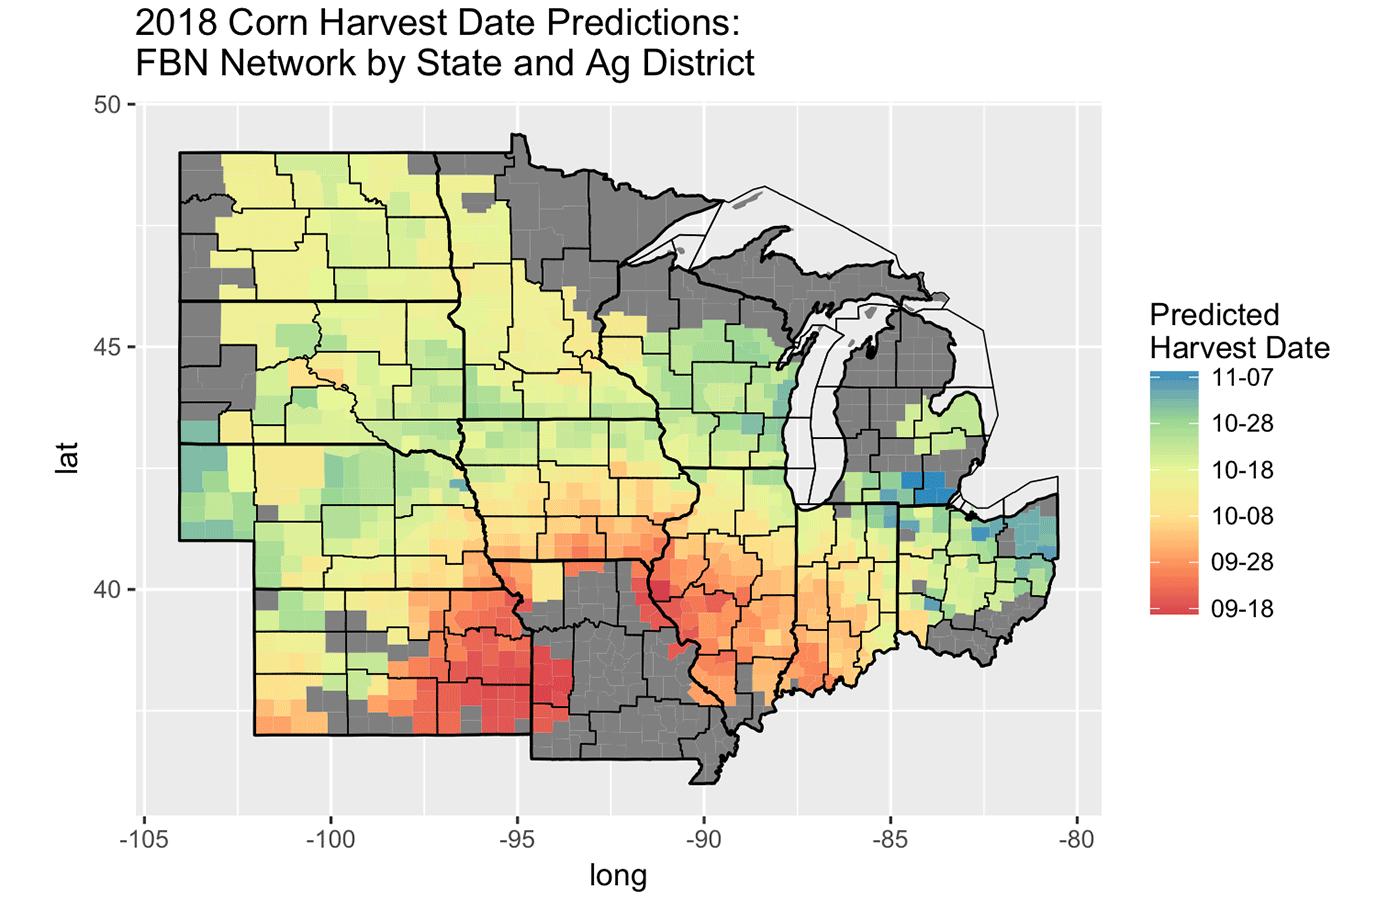 corn harvest prediction dates